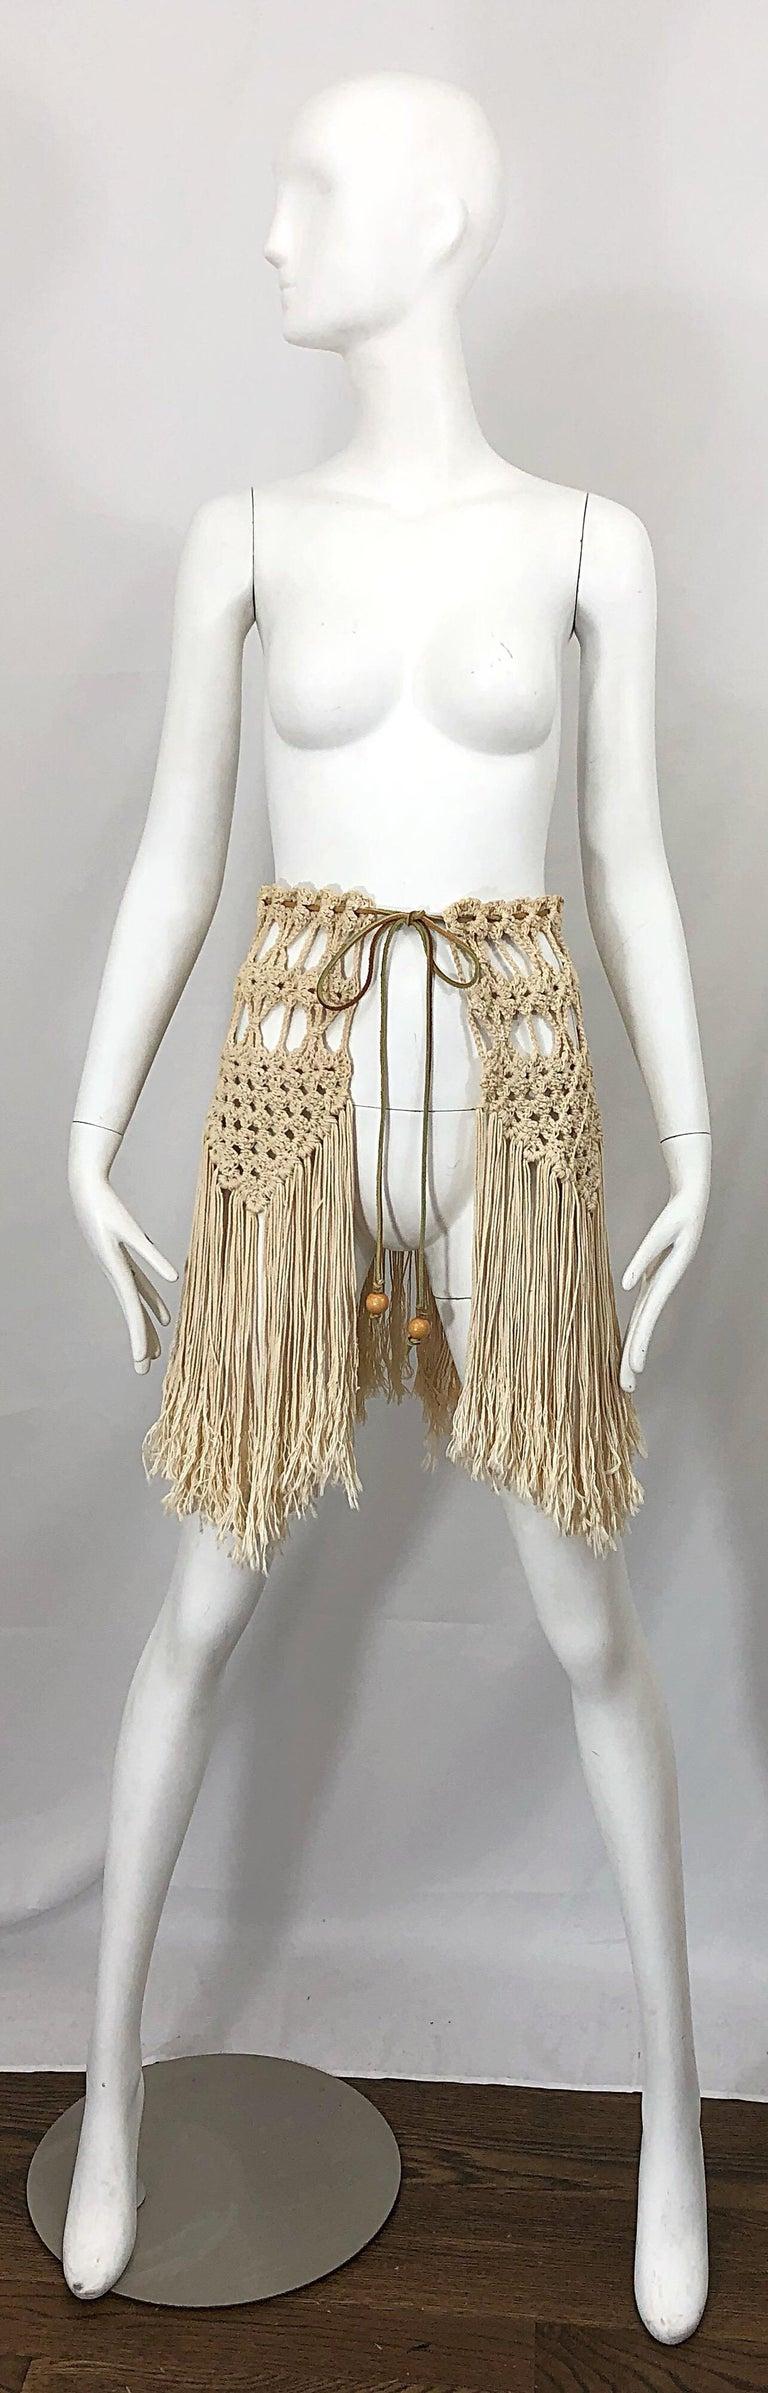 1970s Amazing Khaki Brown Boho Vintage 70s Crochet Fringe Belt Or Capelet Cape For Sale 11